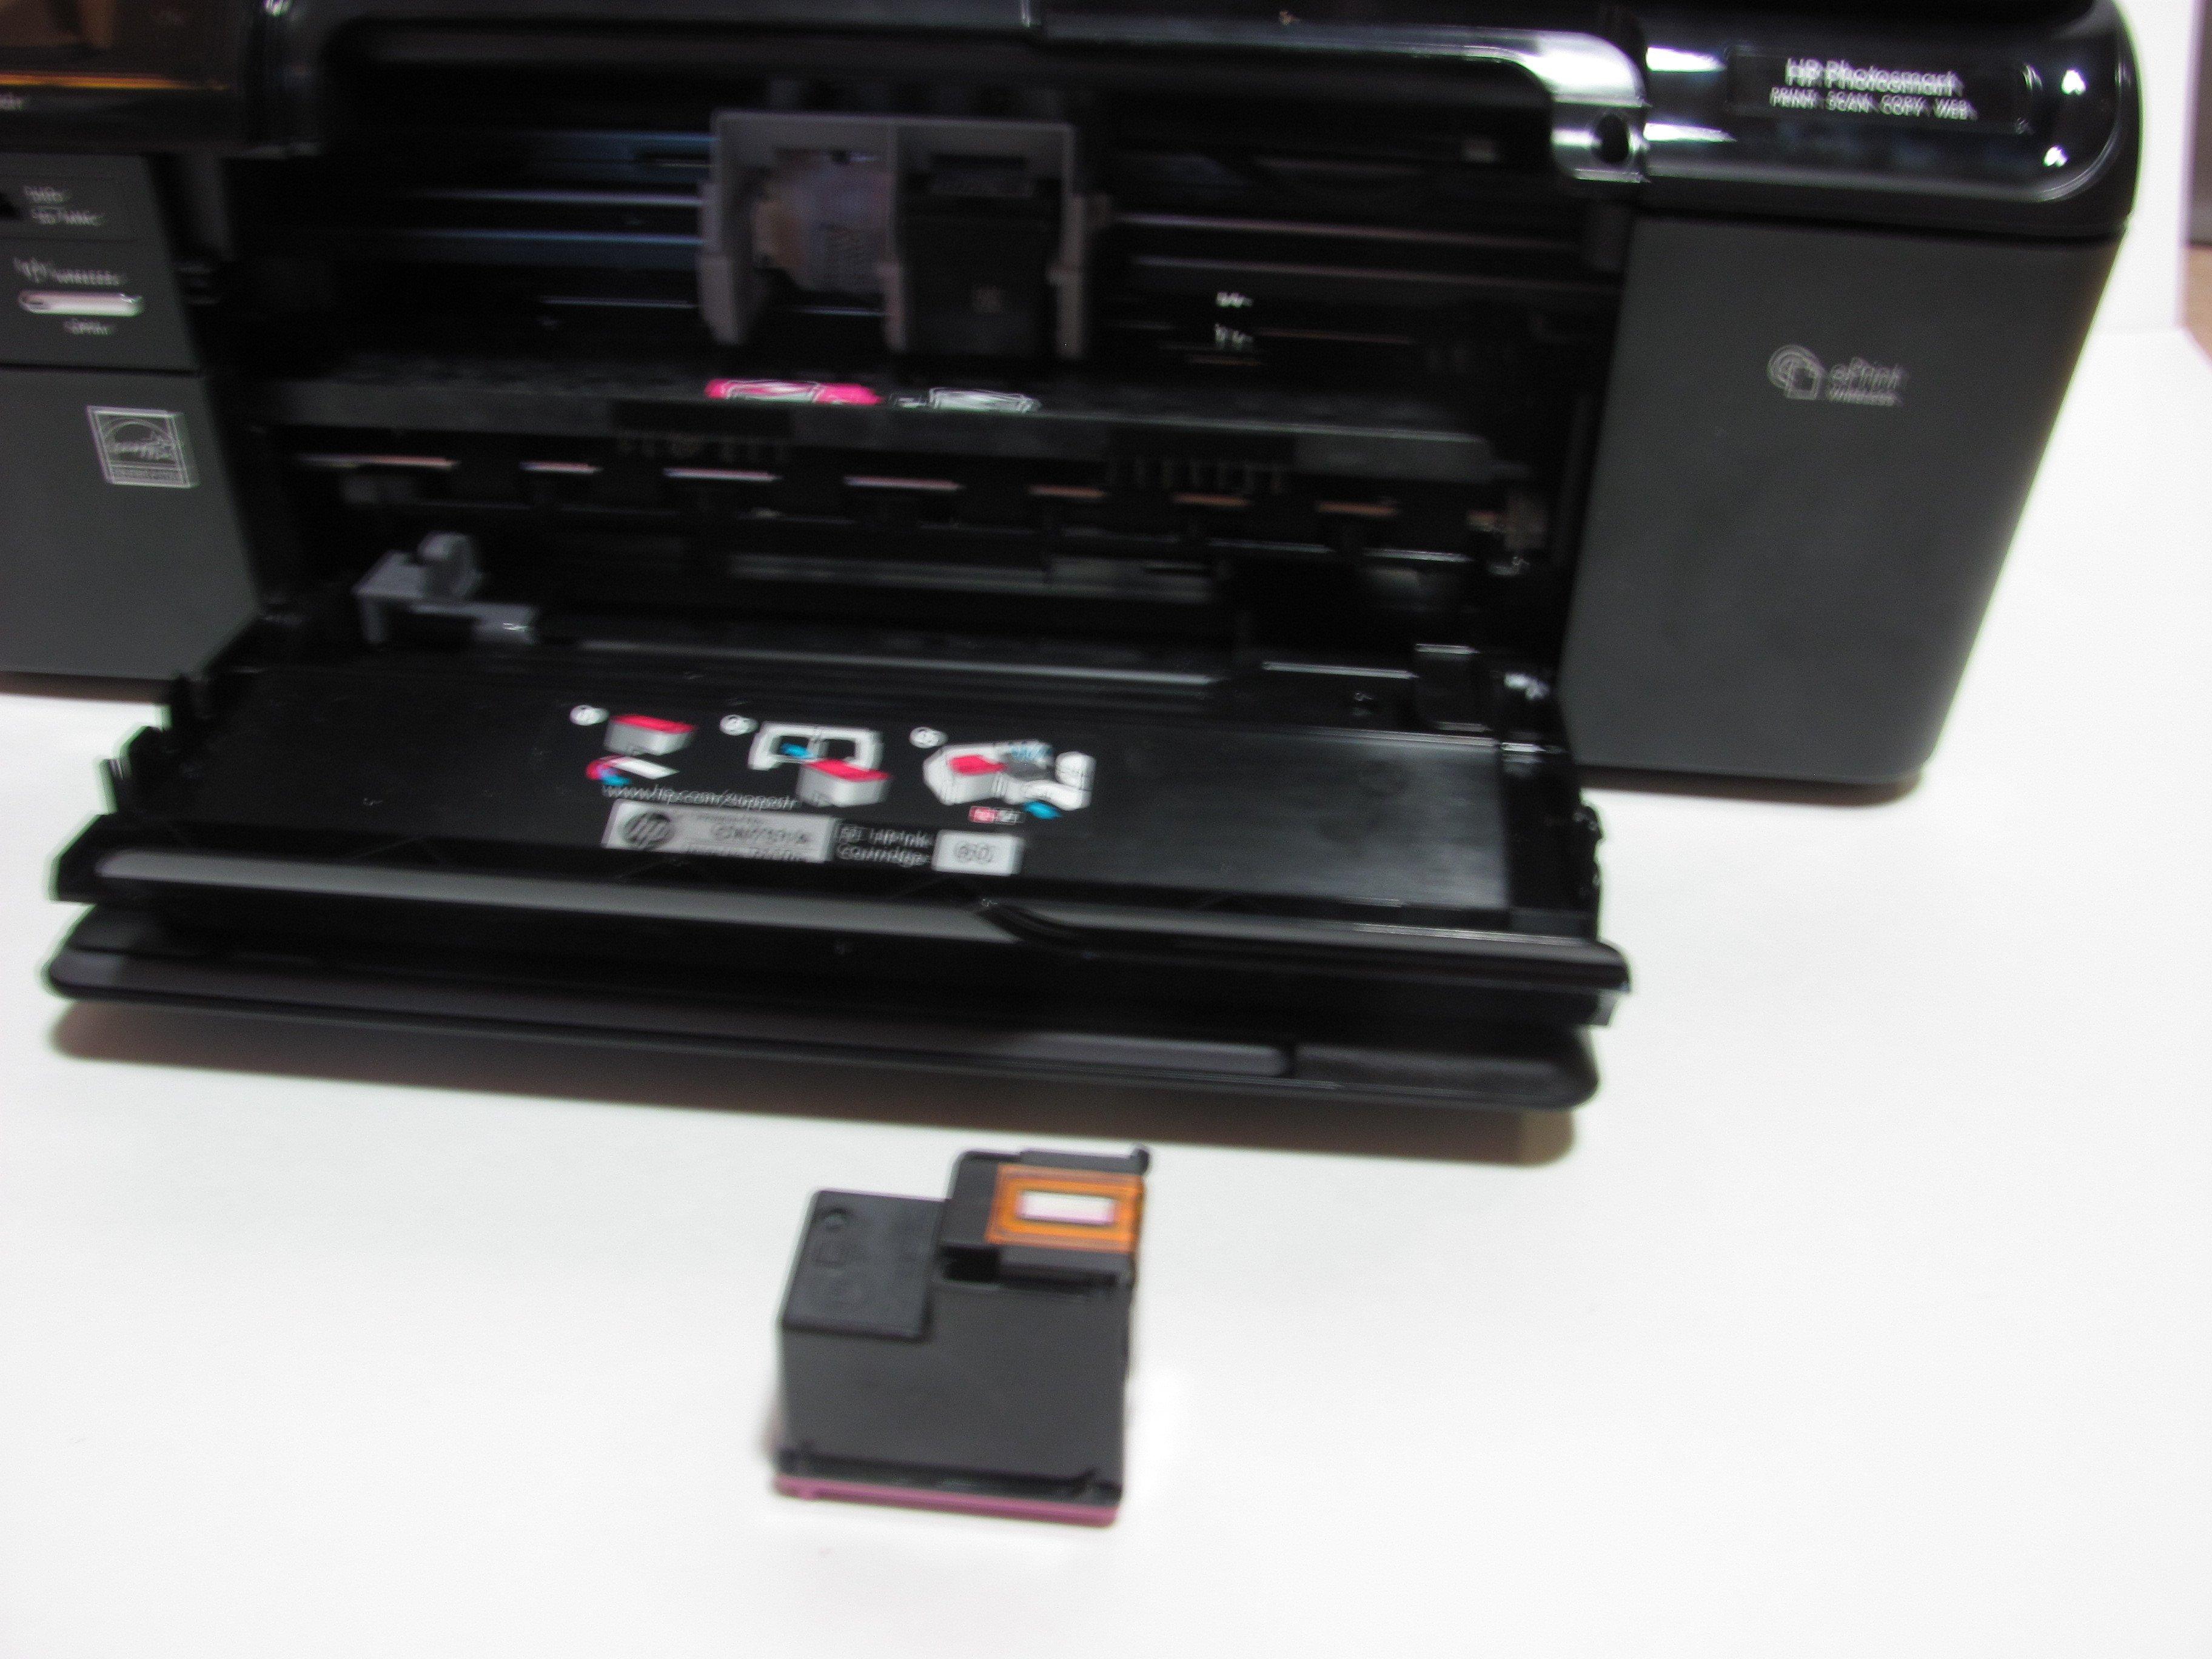 Hp Photosmart D110a Ink Cartridge Replacement Ifixit